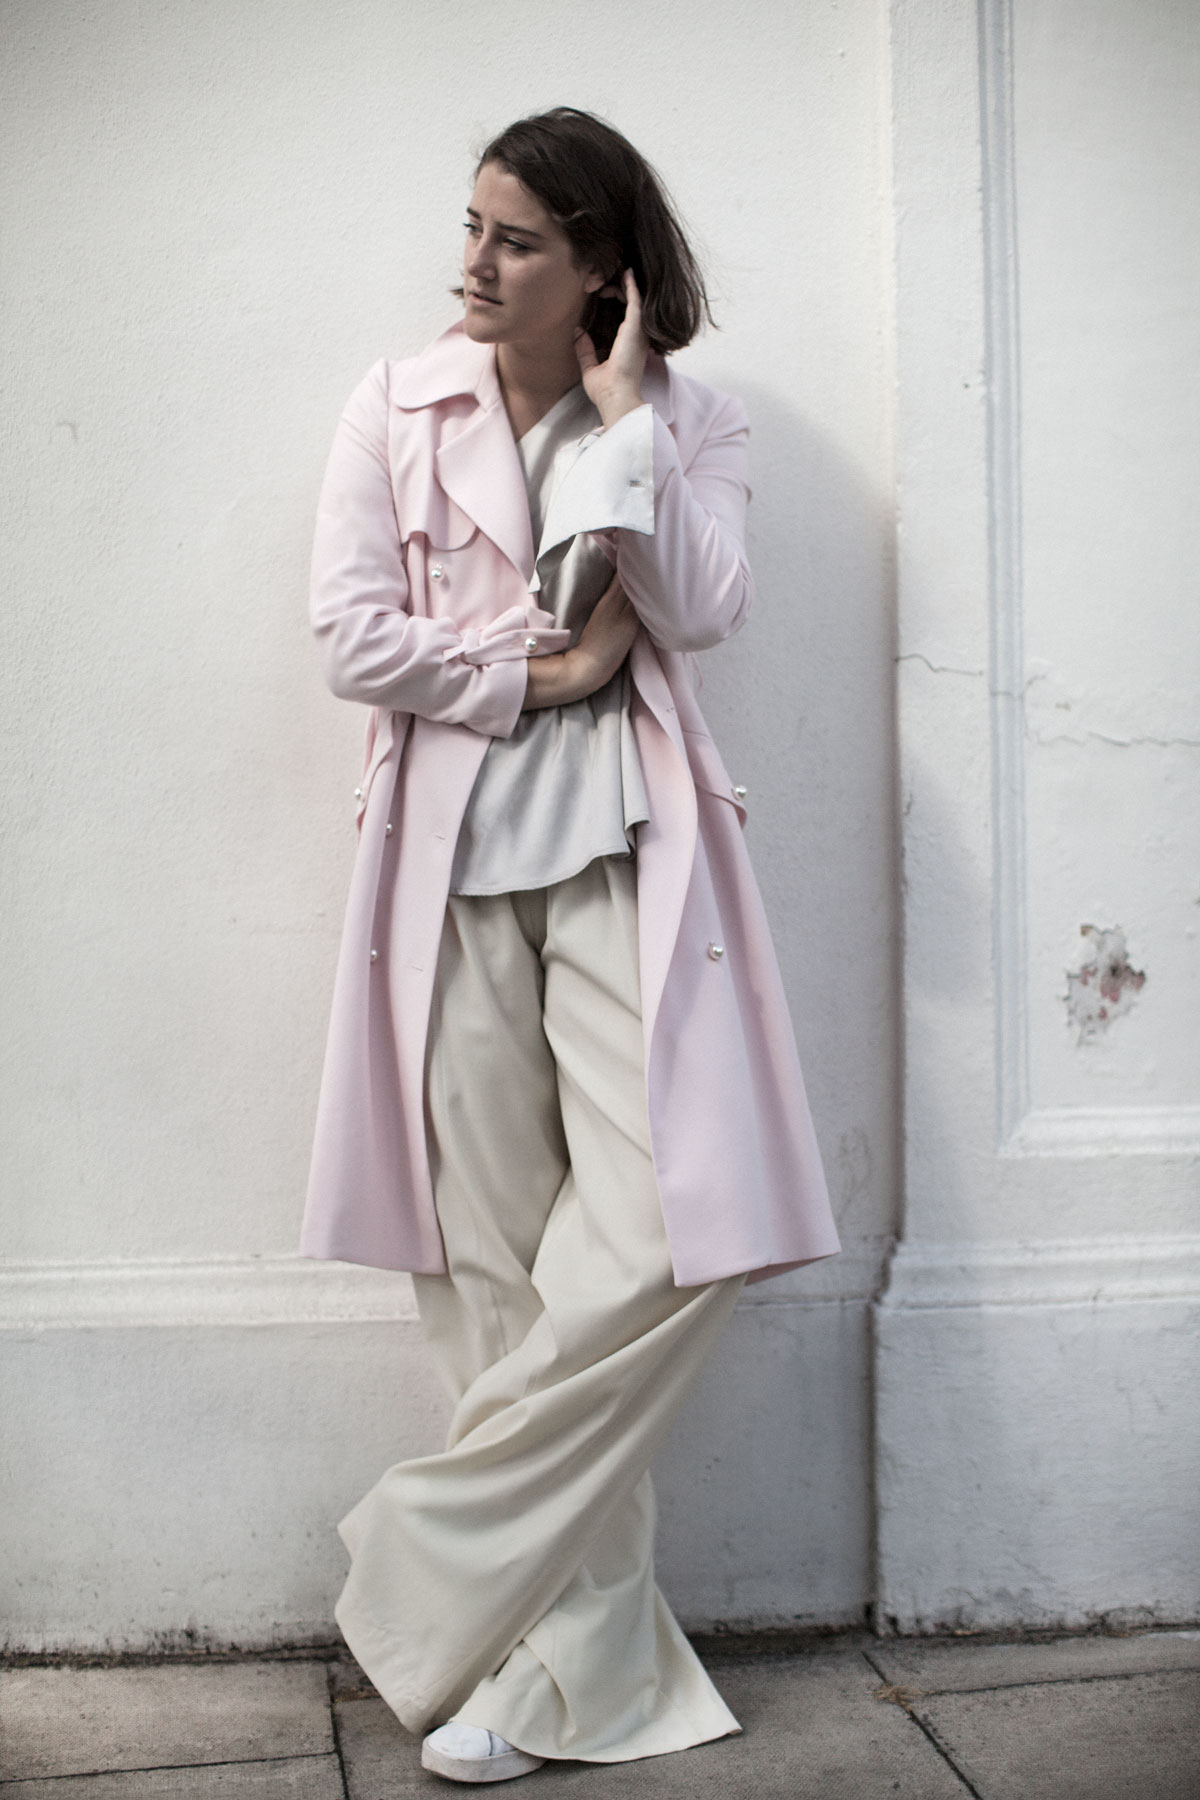 claudie-pierlot-pink-trench-harrods-girl-a-la-mode-2